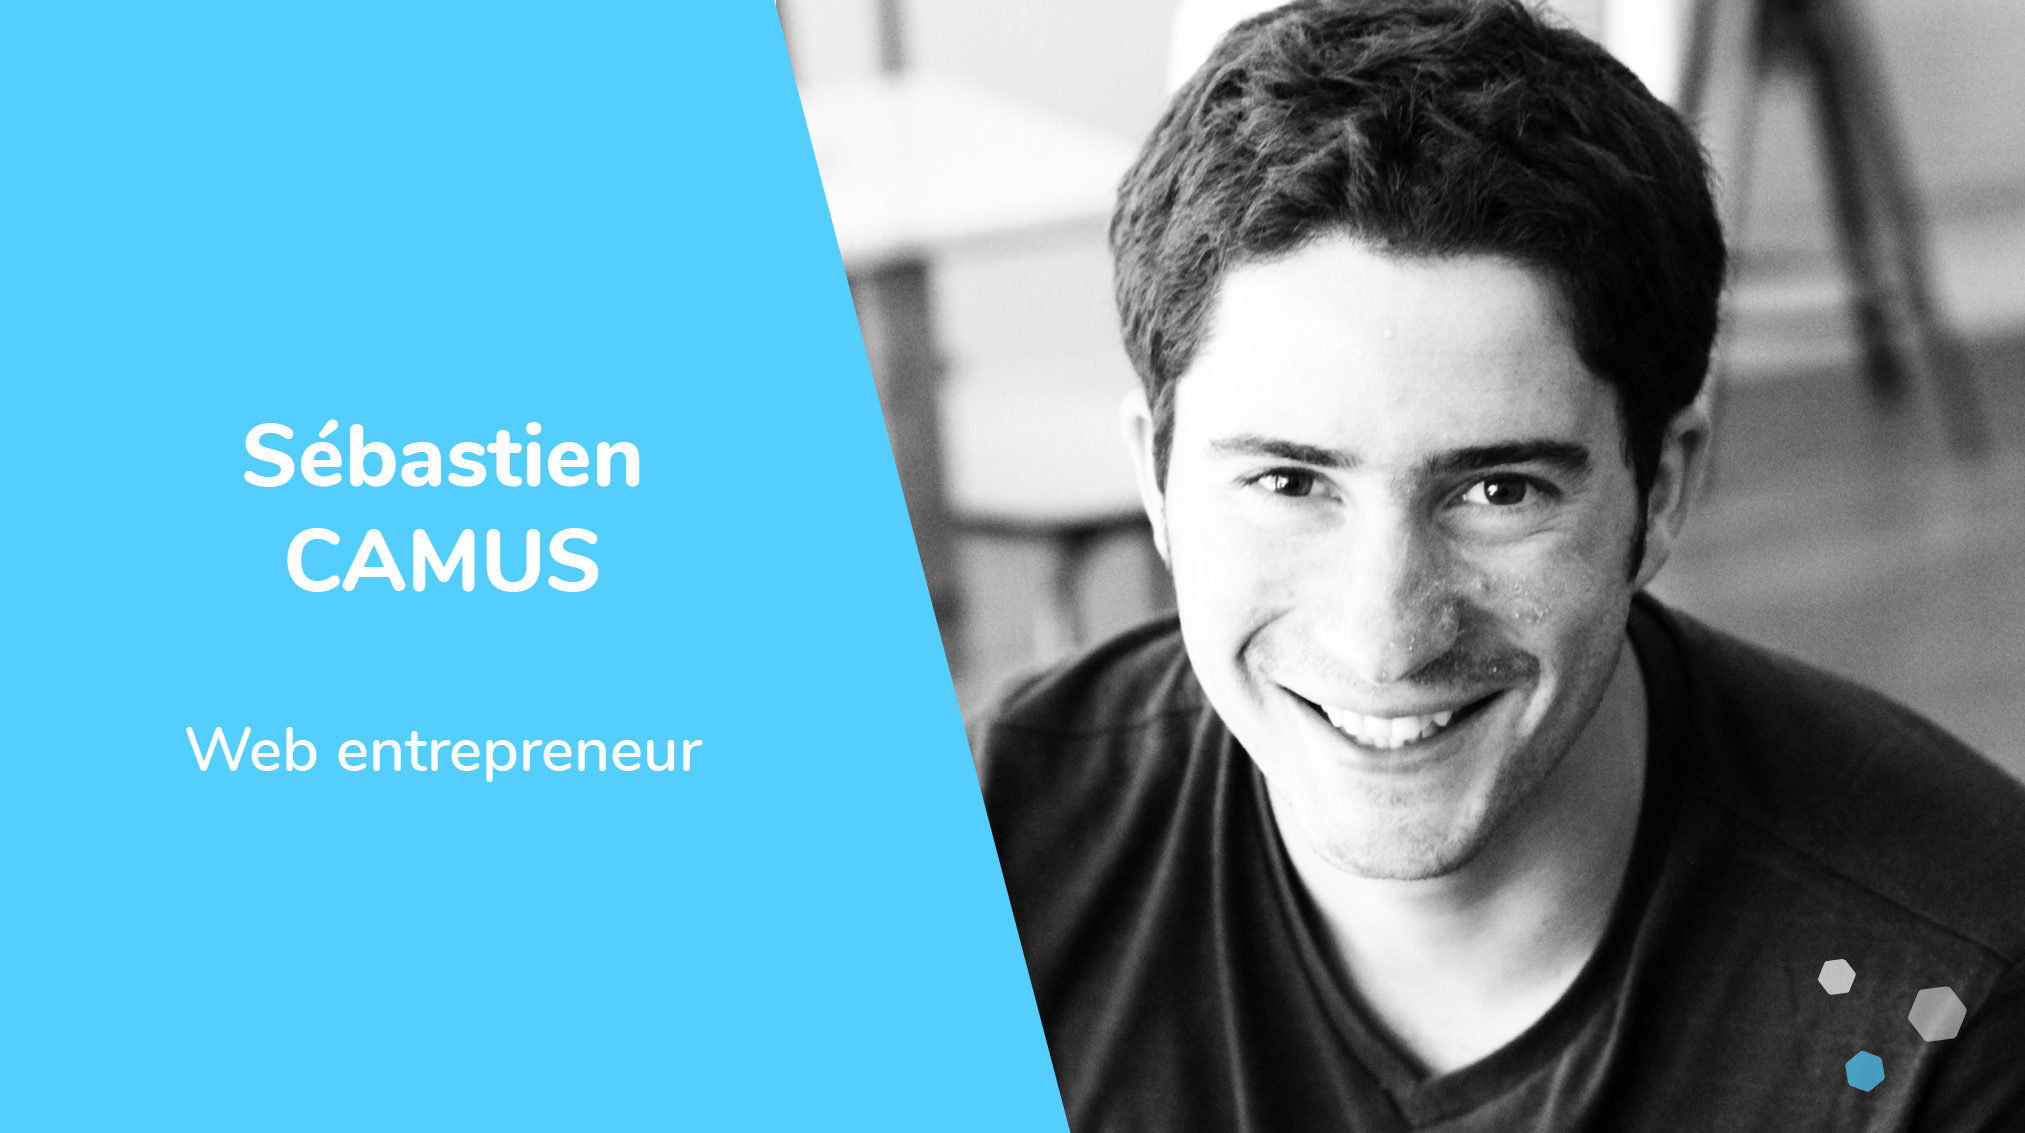 Sébastien Camus, Web entrepreneur